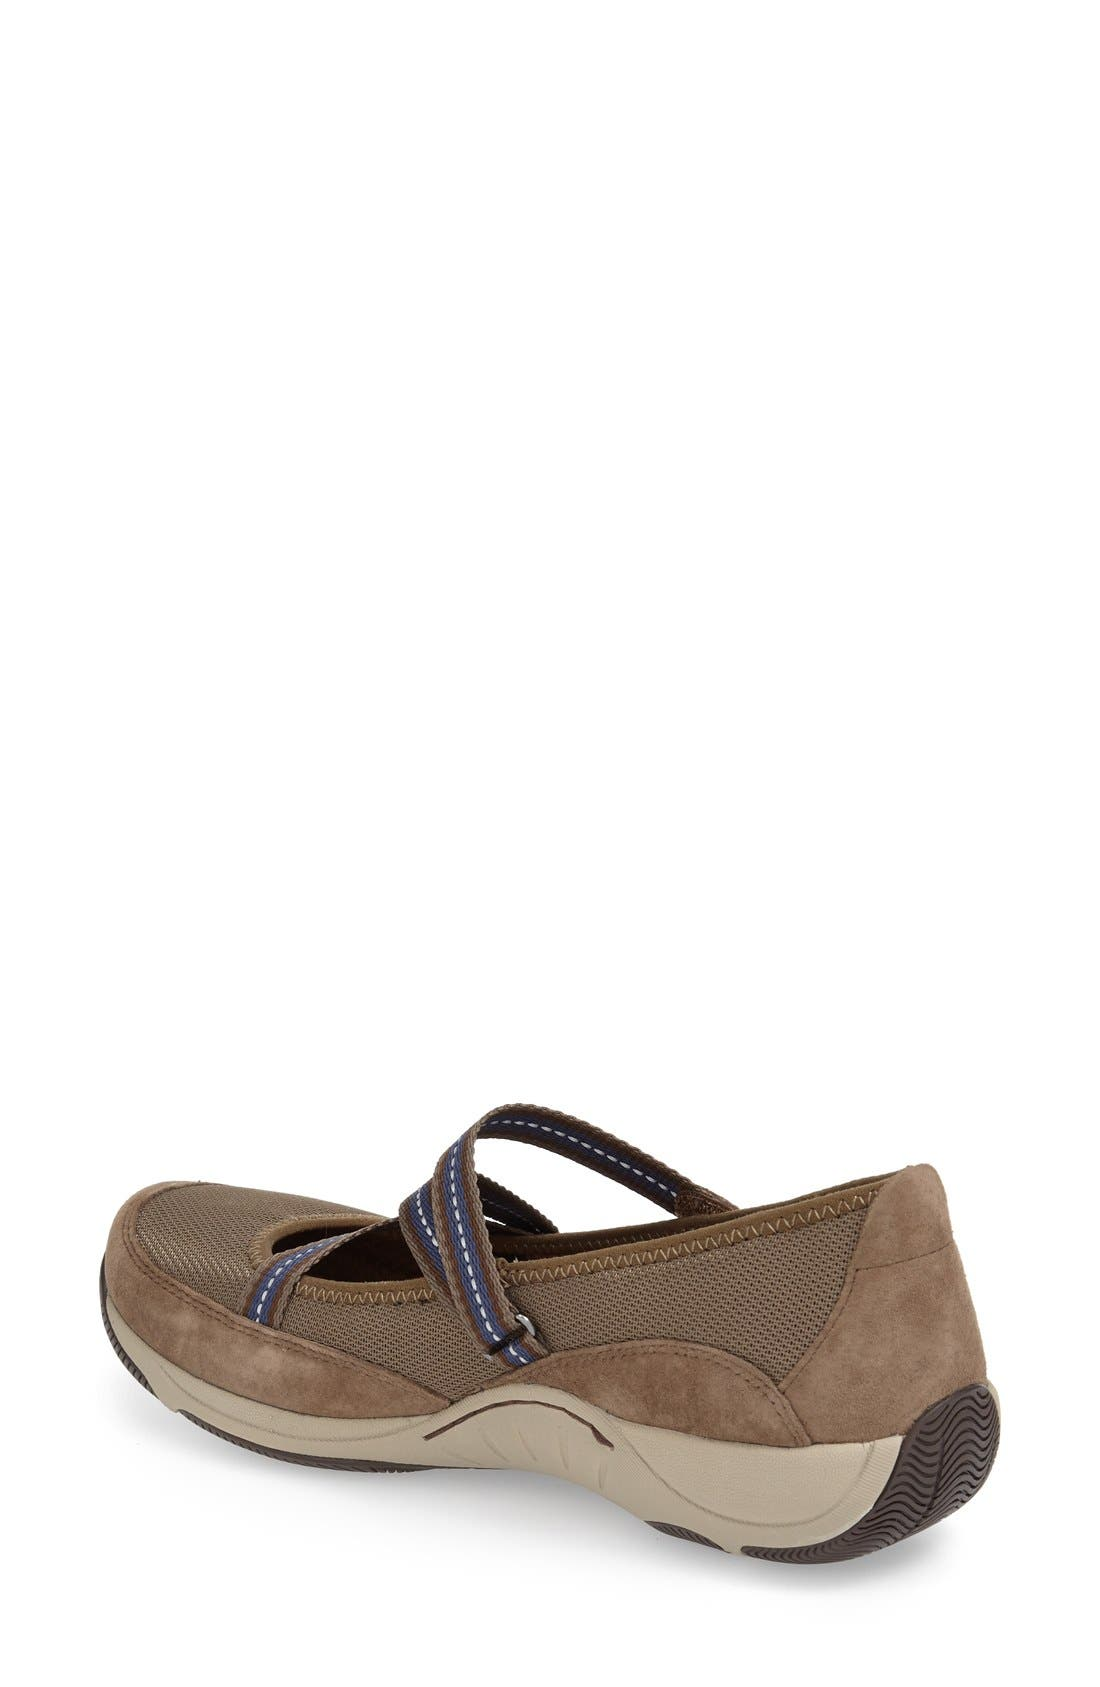 'Hazel' Slip-On Sneaker,                             Alternate thumbnail 3, color,                             Taupe Suede